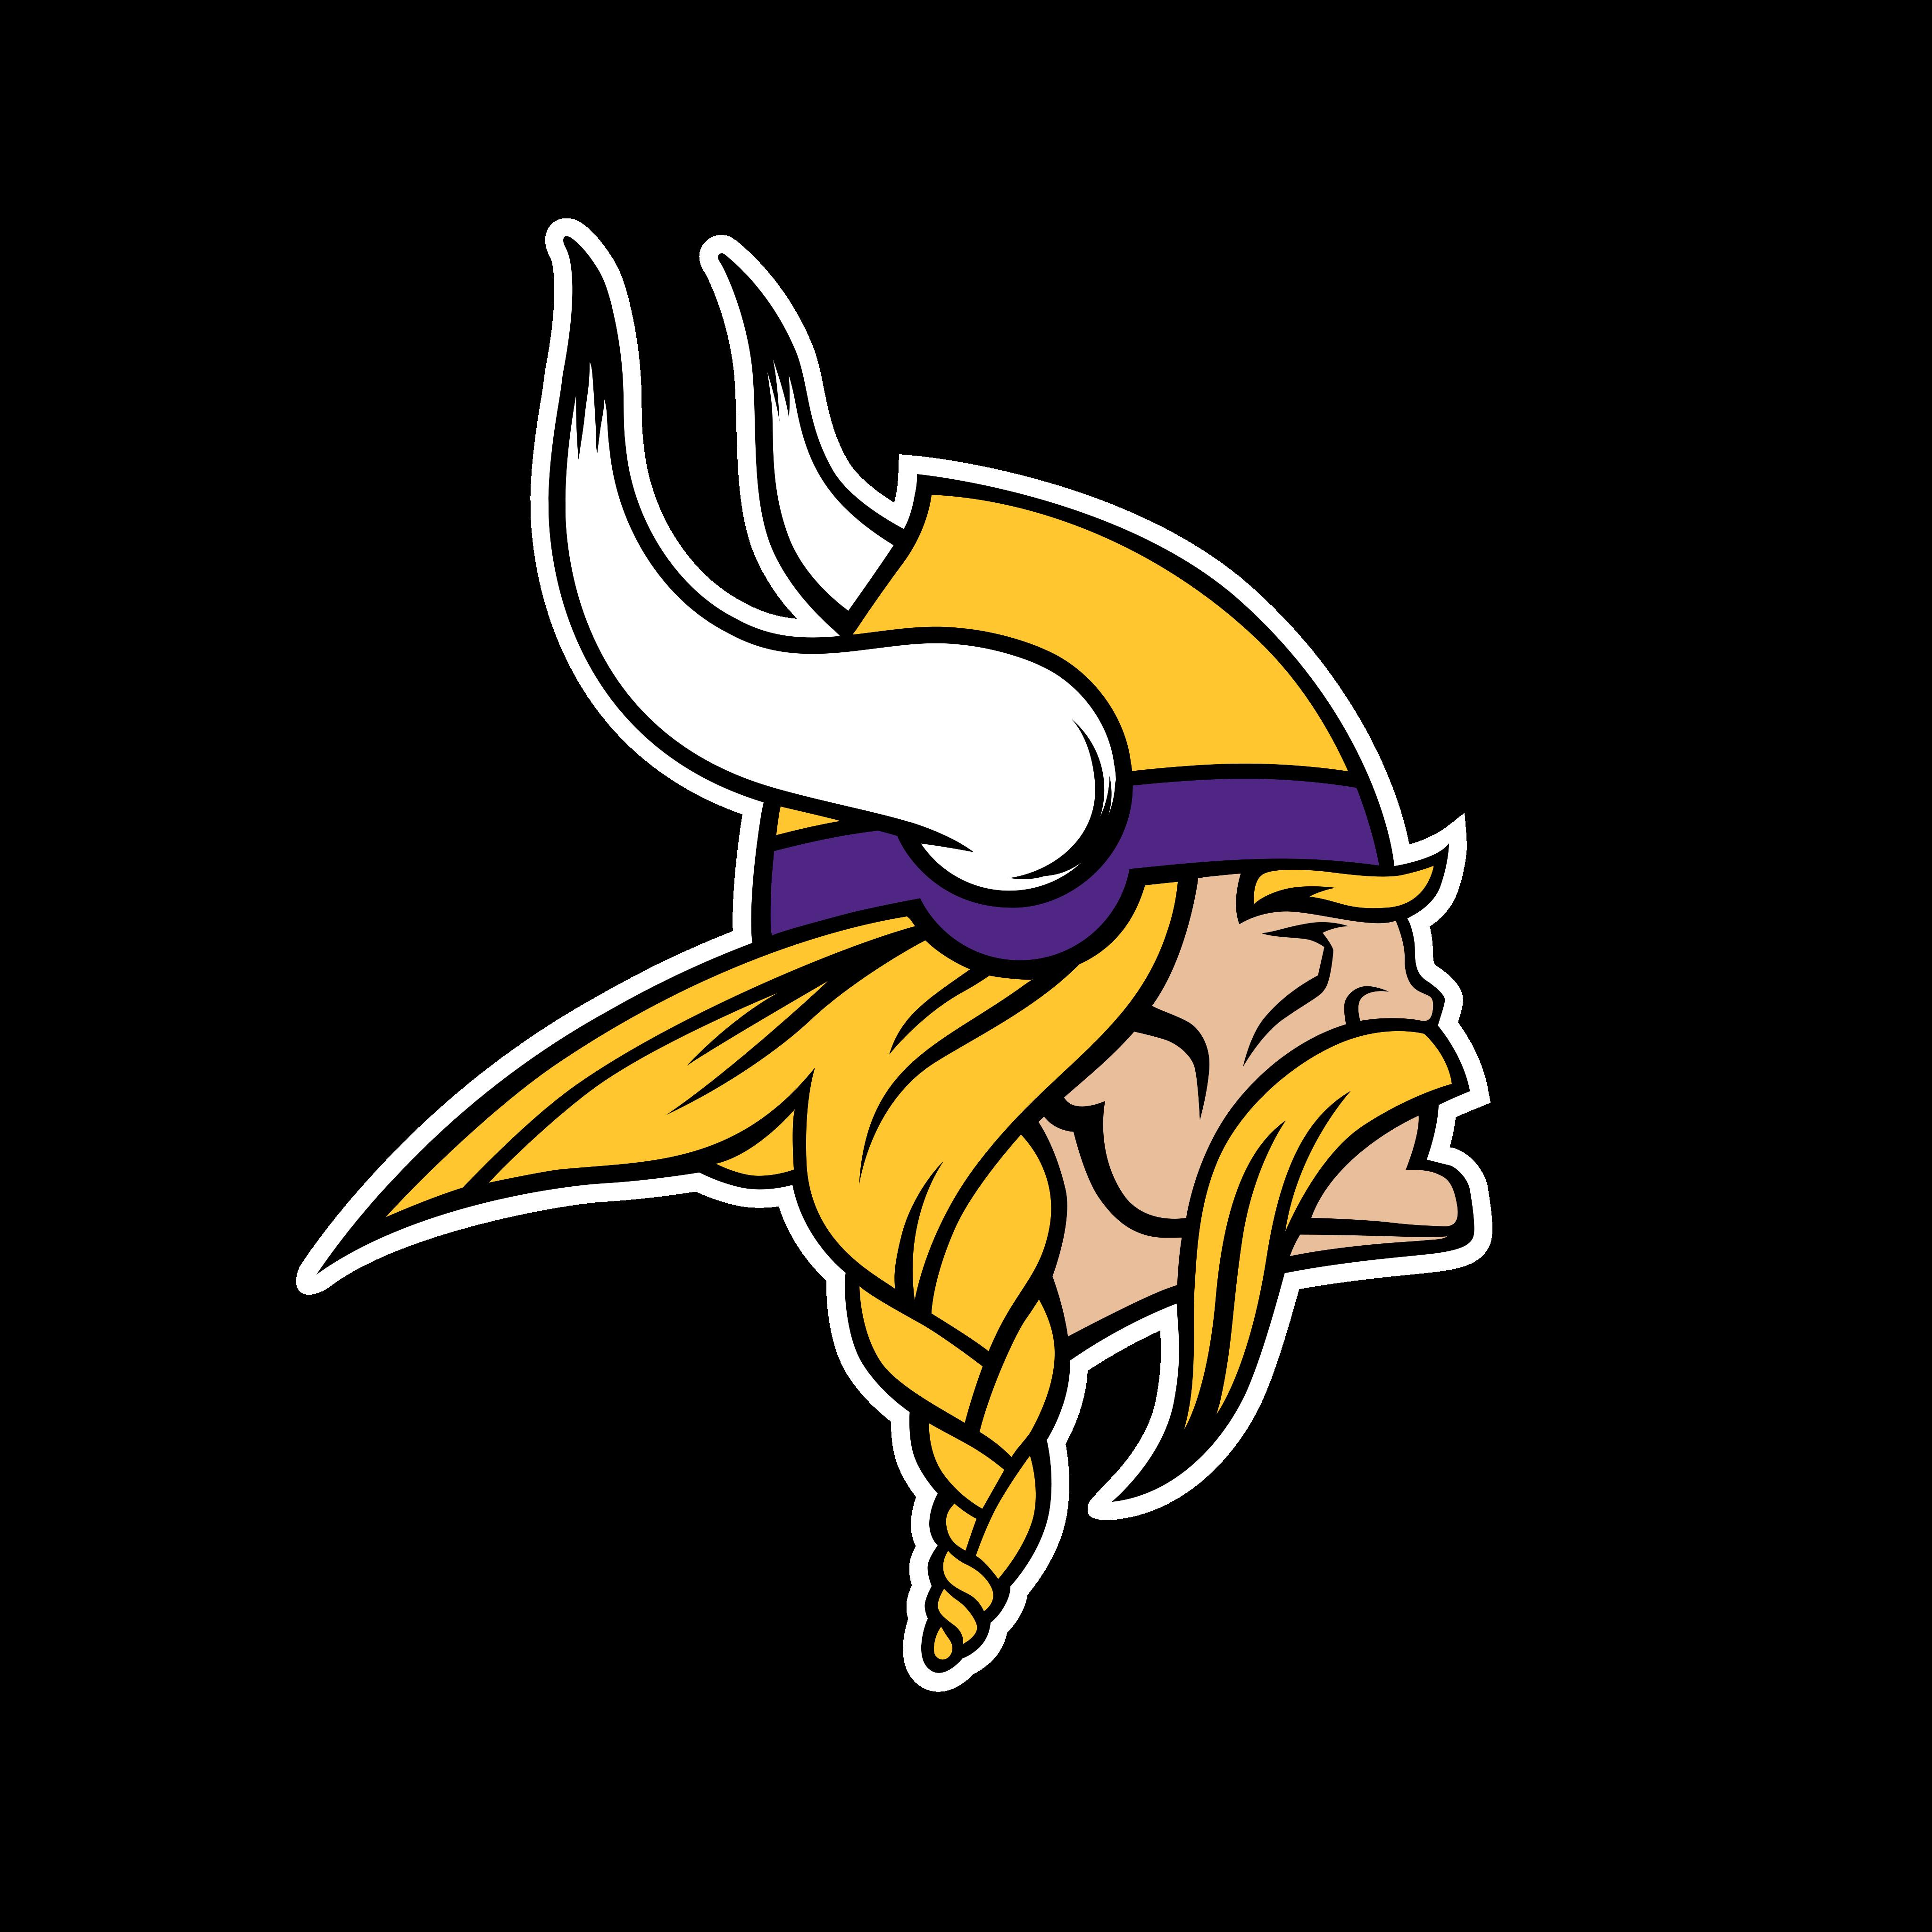 minnesota vikings logo 0 - Minnesota Vikings Logo